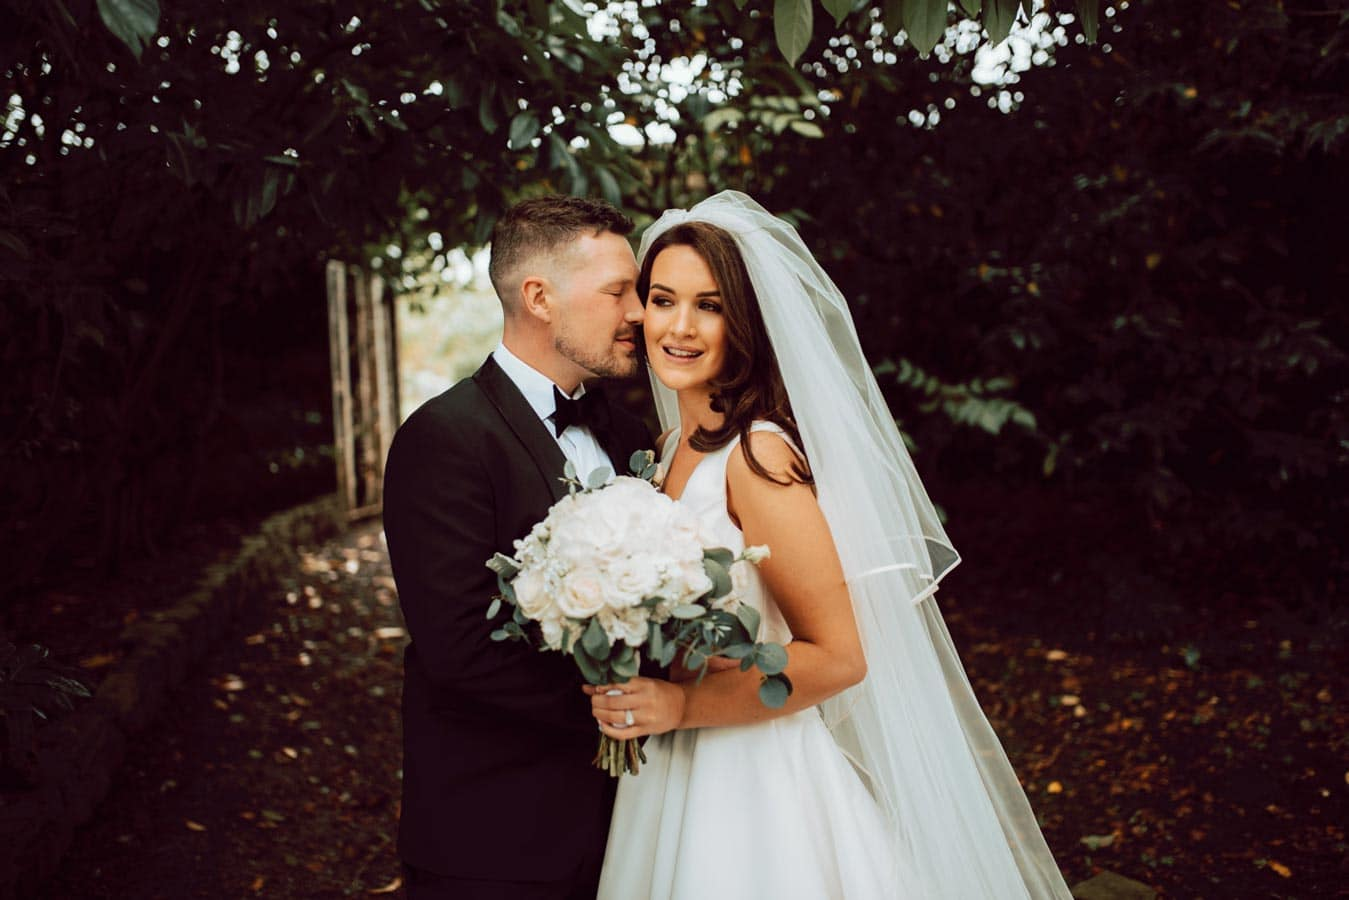 Weddings By Jason 23